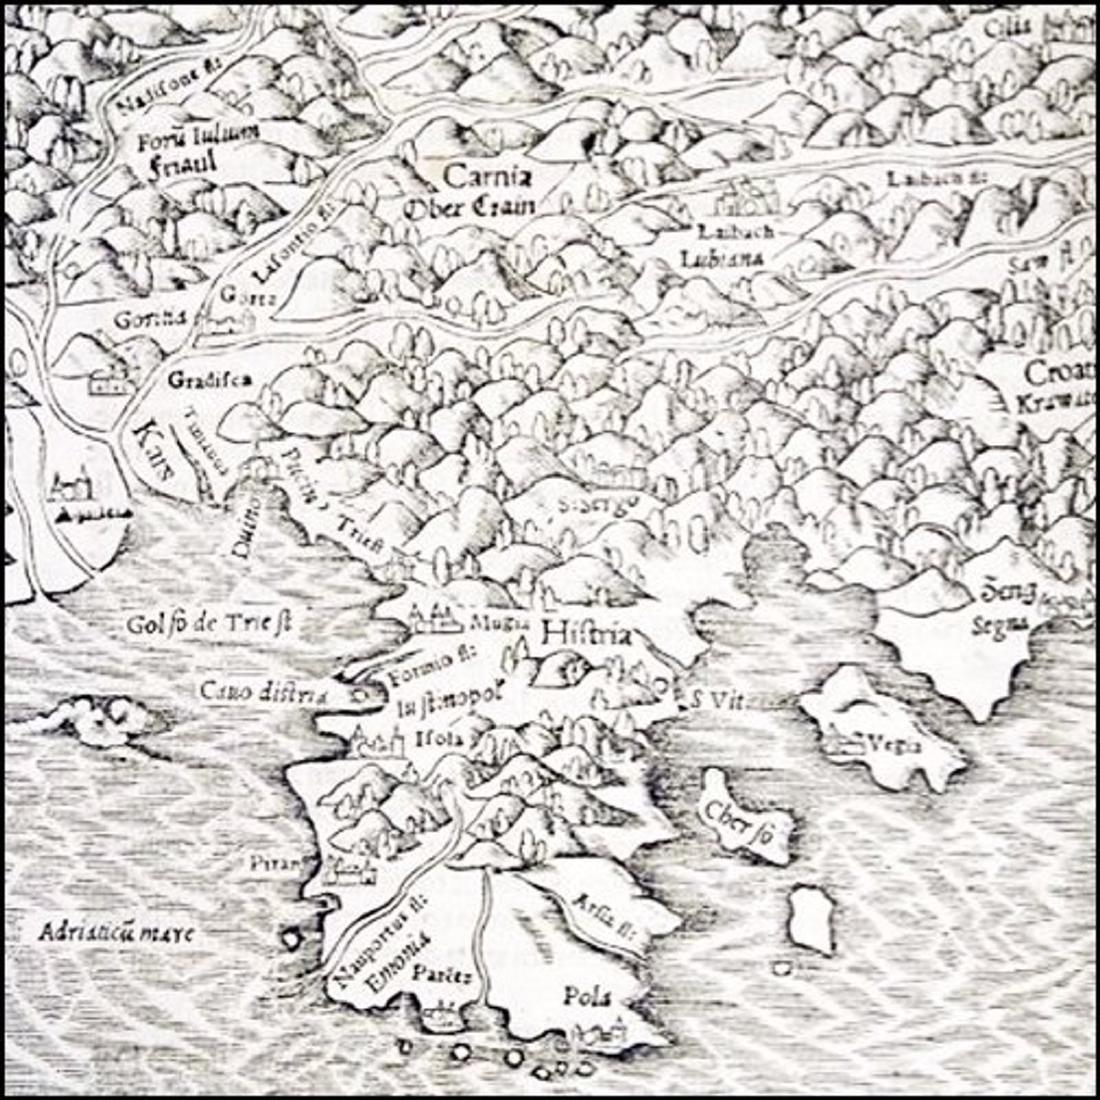 [Cosmography, Explorations] Piccolomini, 1551